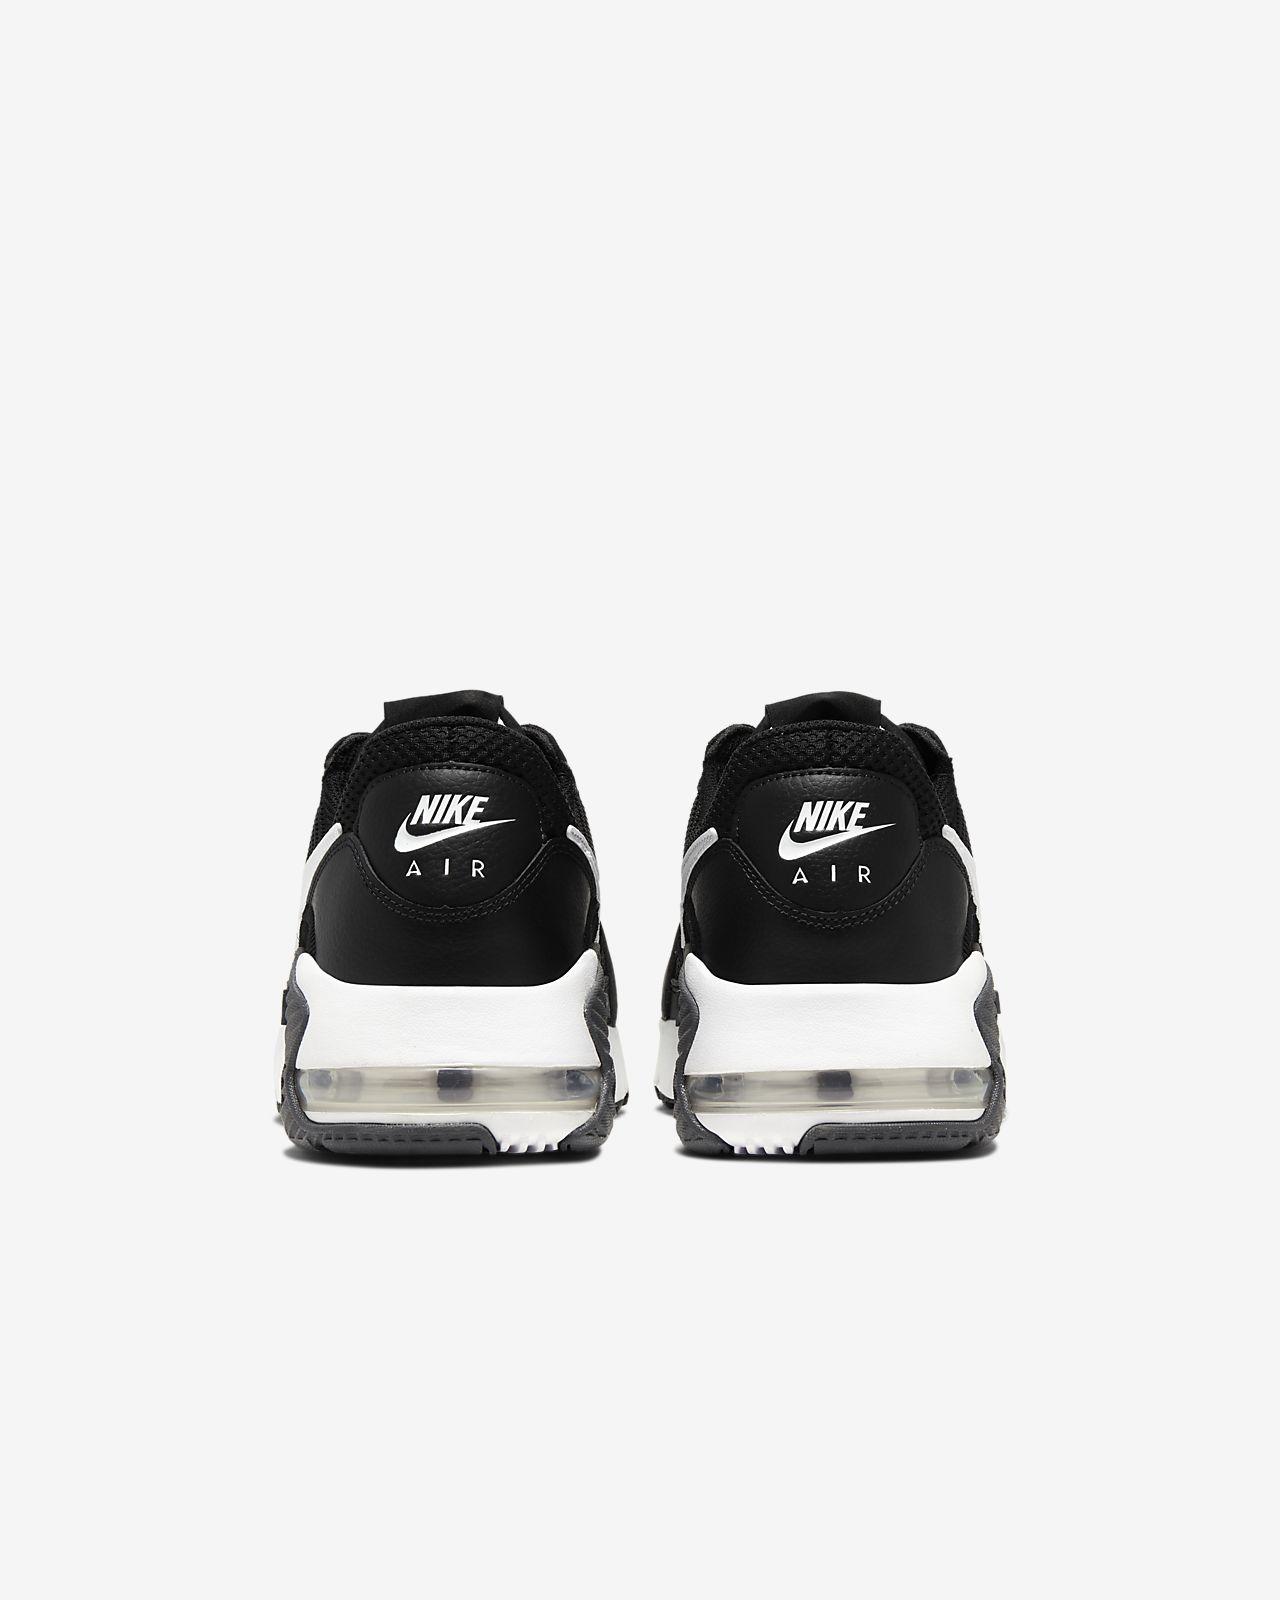 Discount Nike Air Max Command Flex | Girls Nike Lifestyle